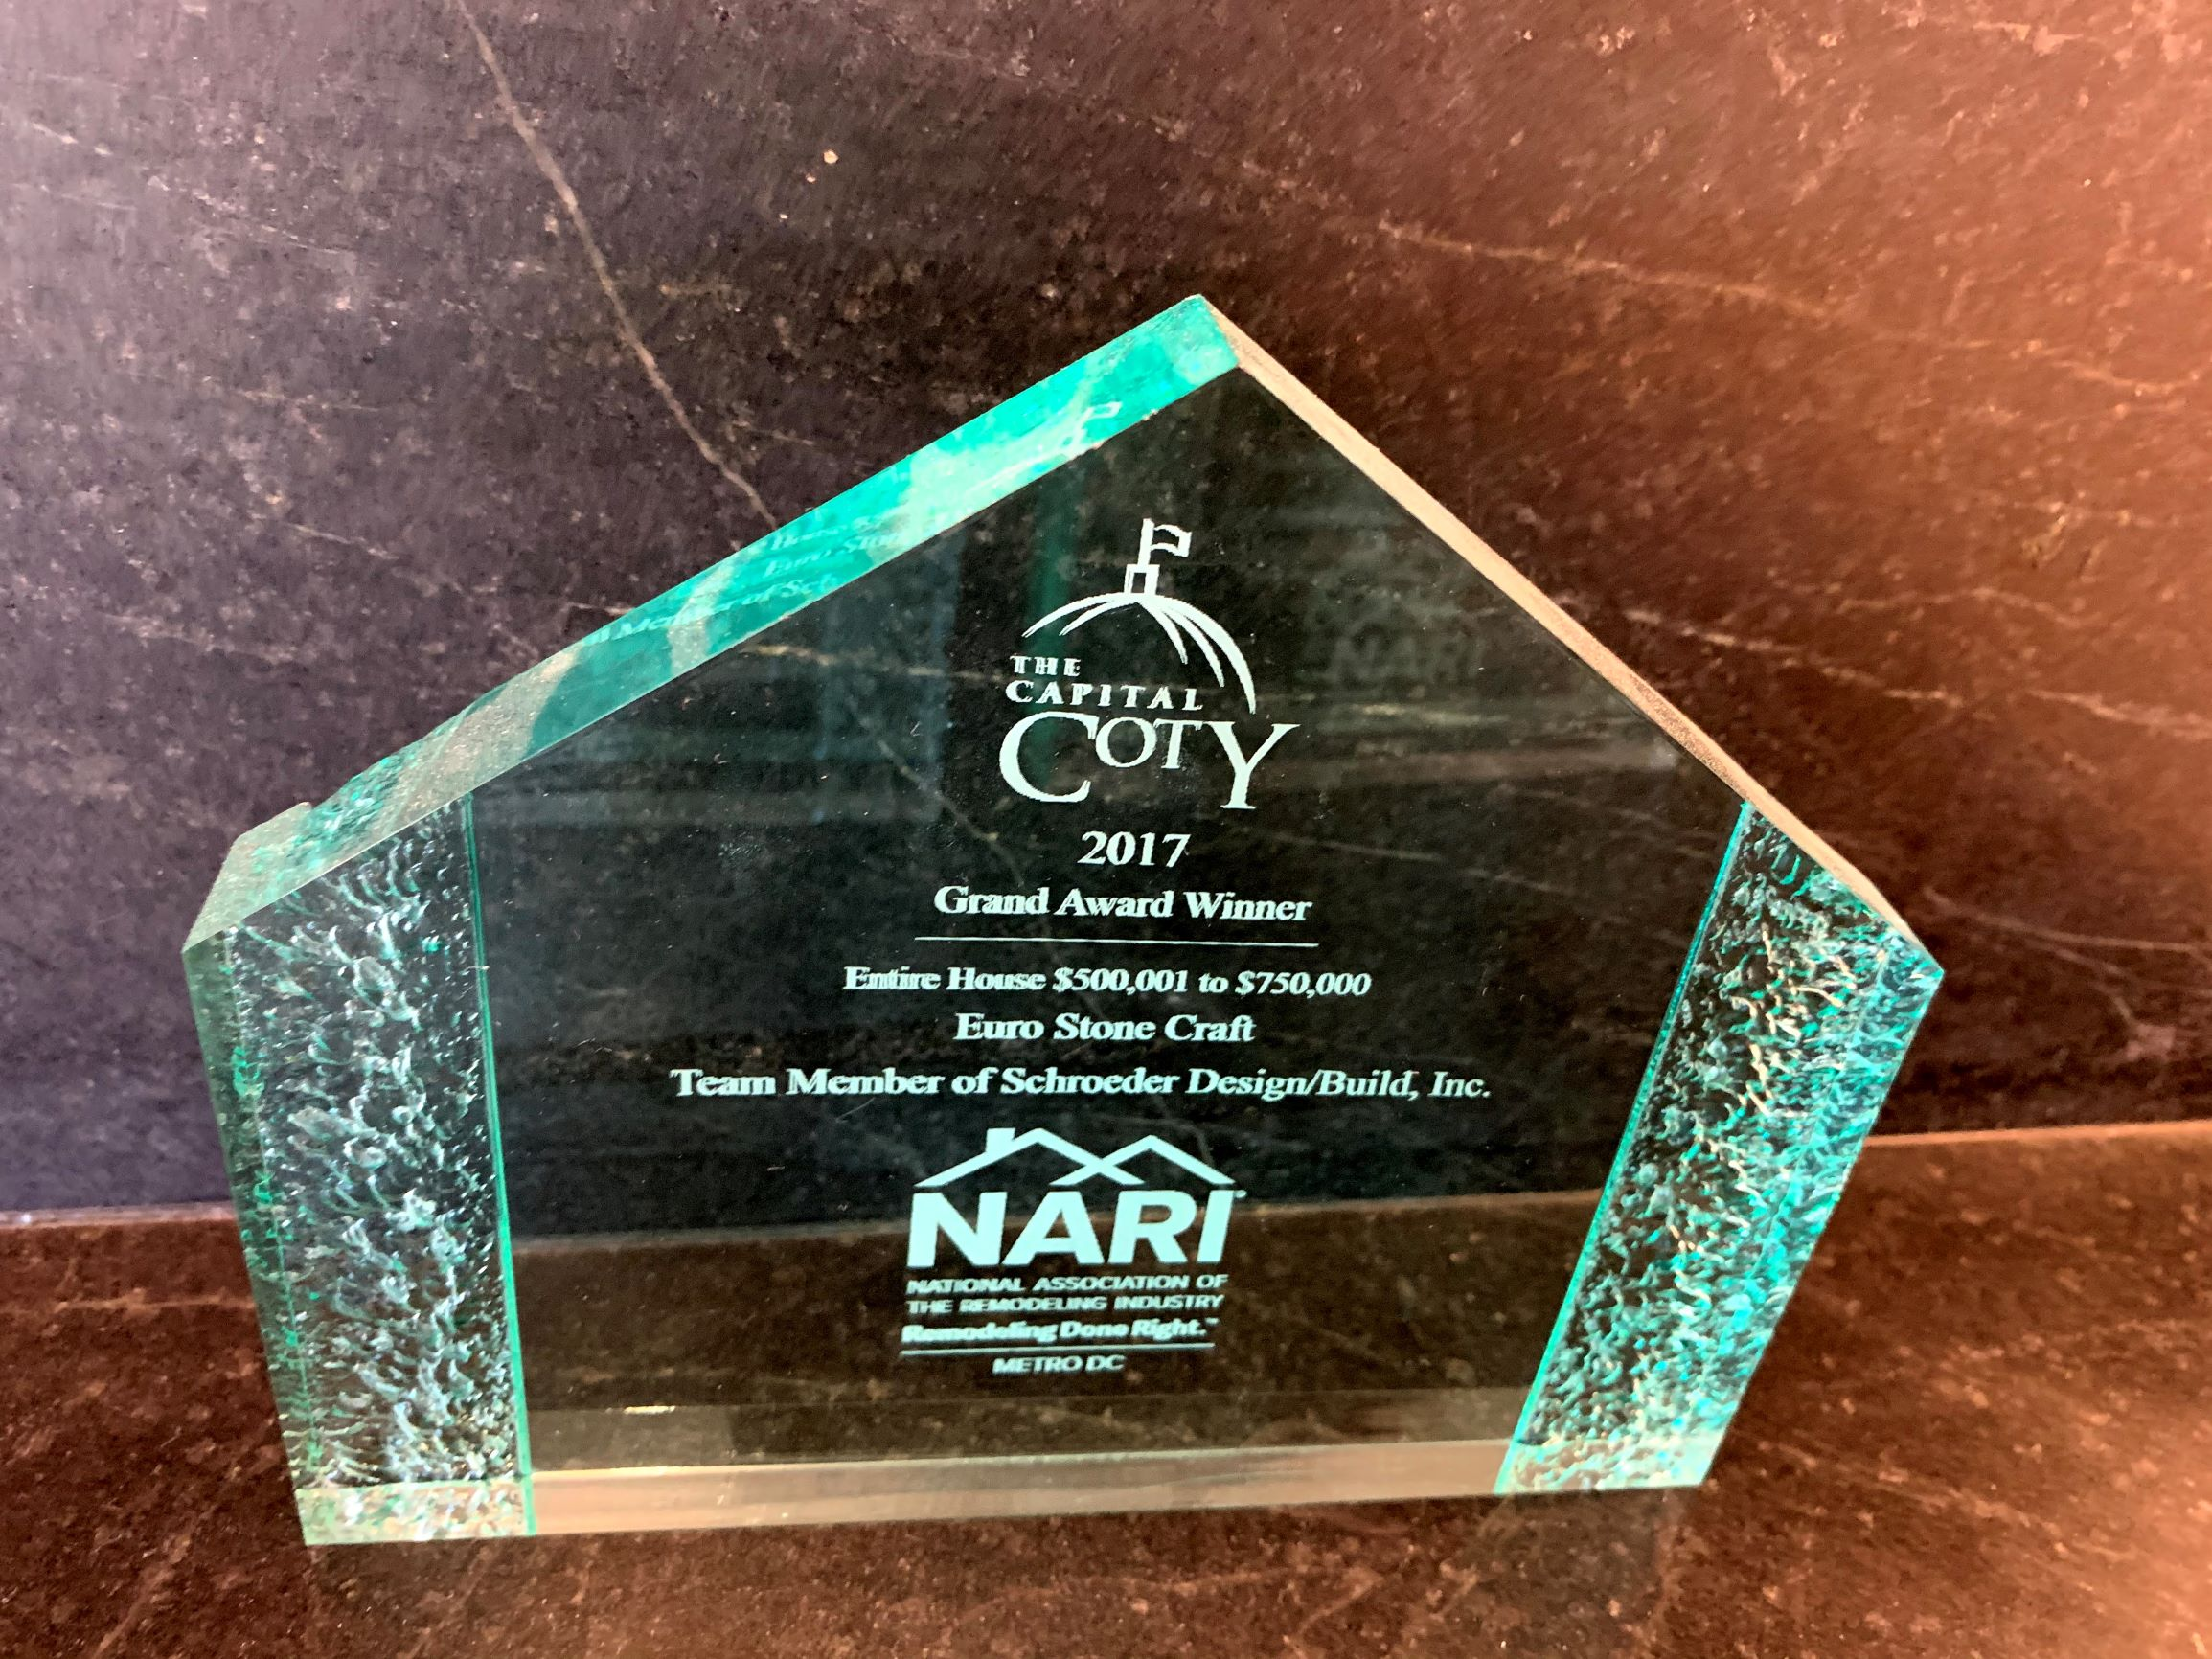 ESC Coty Award 2017 Entire House